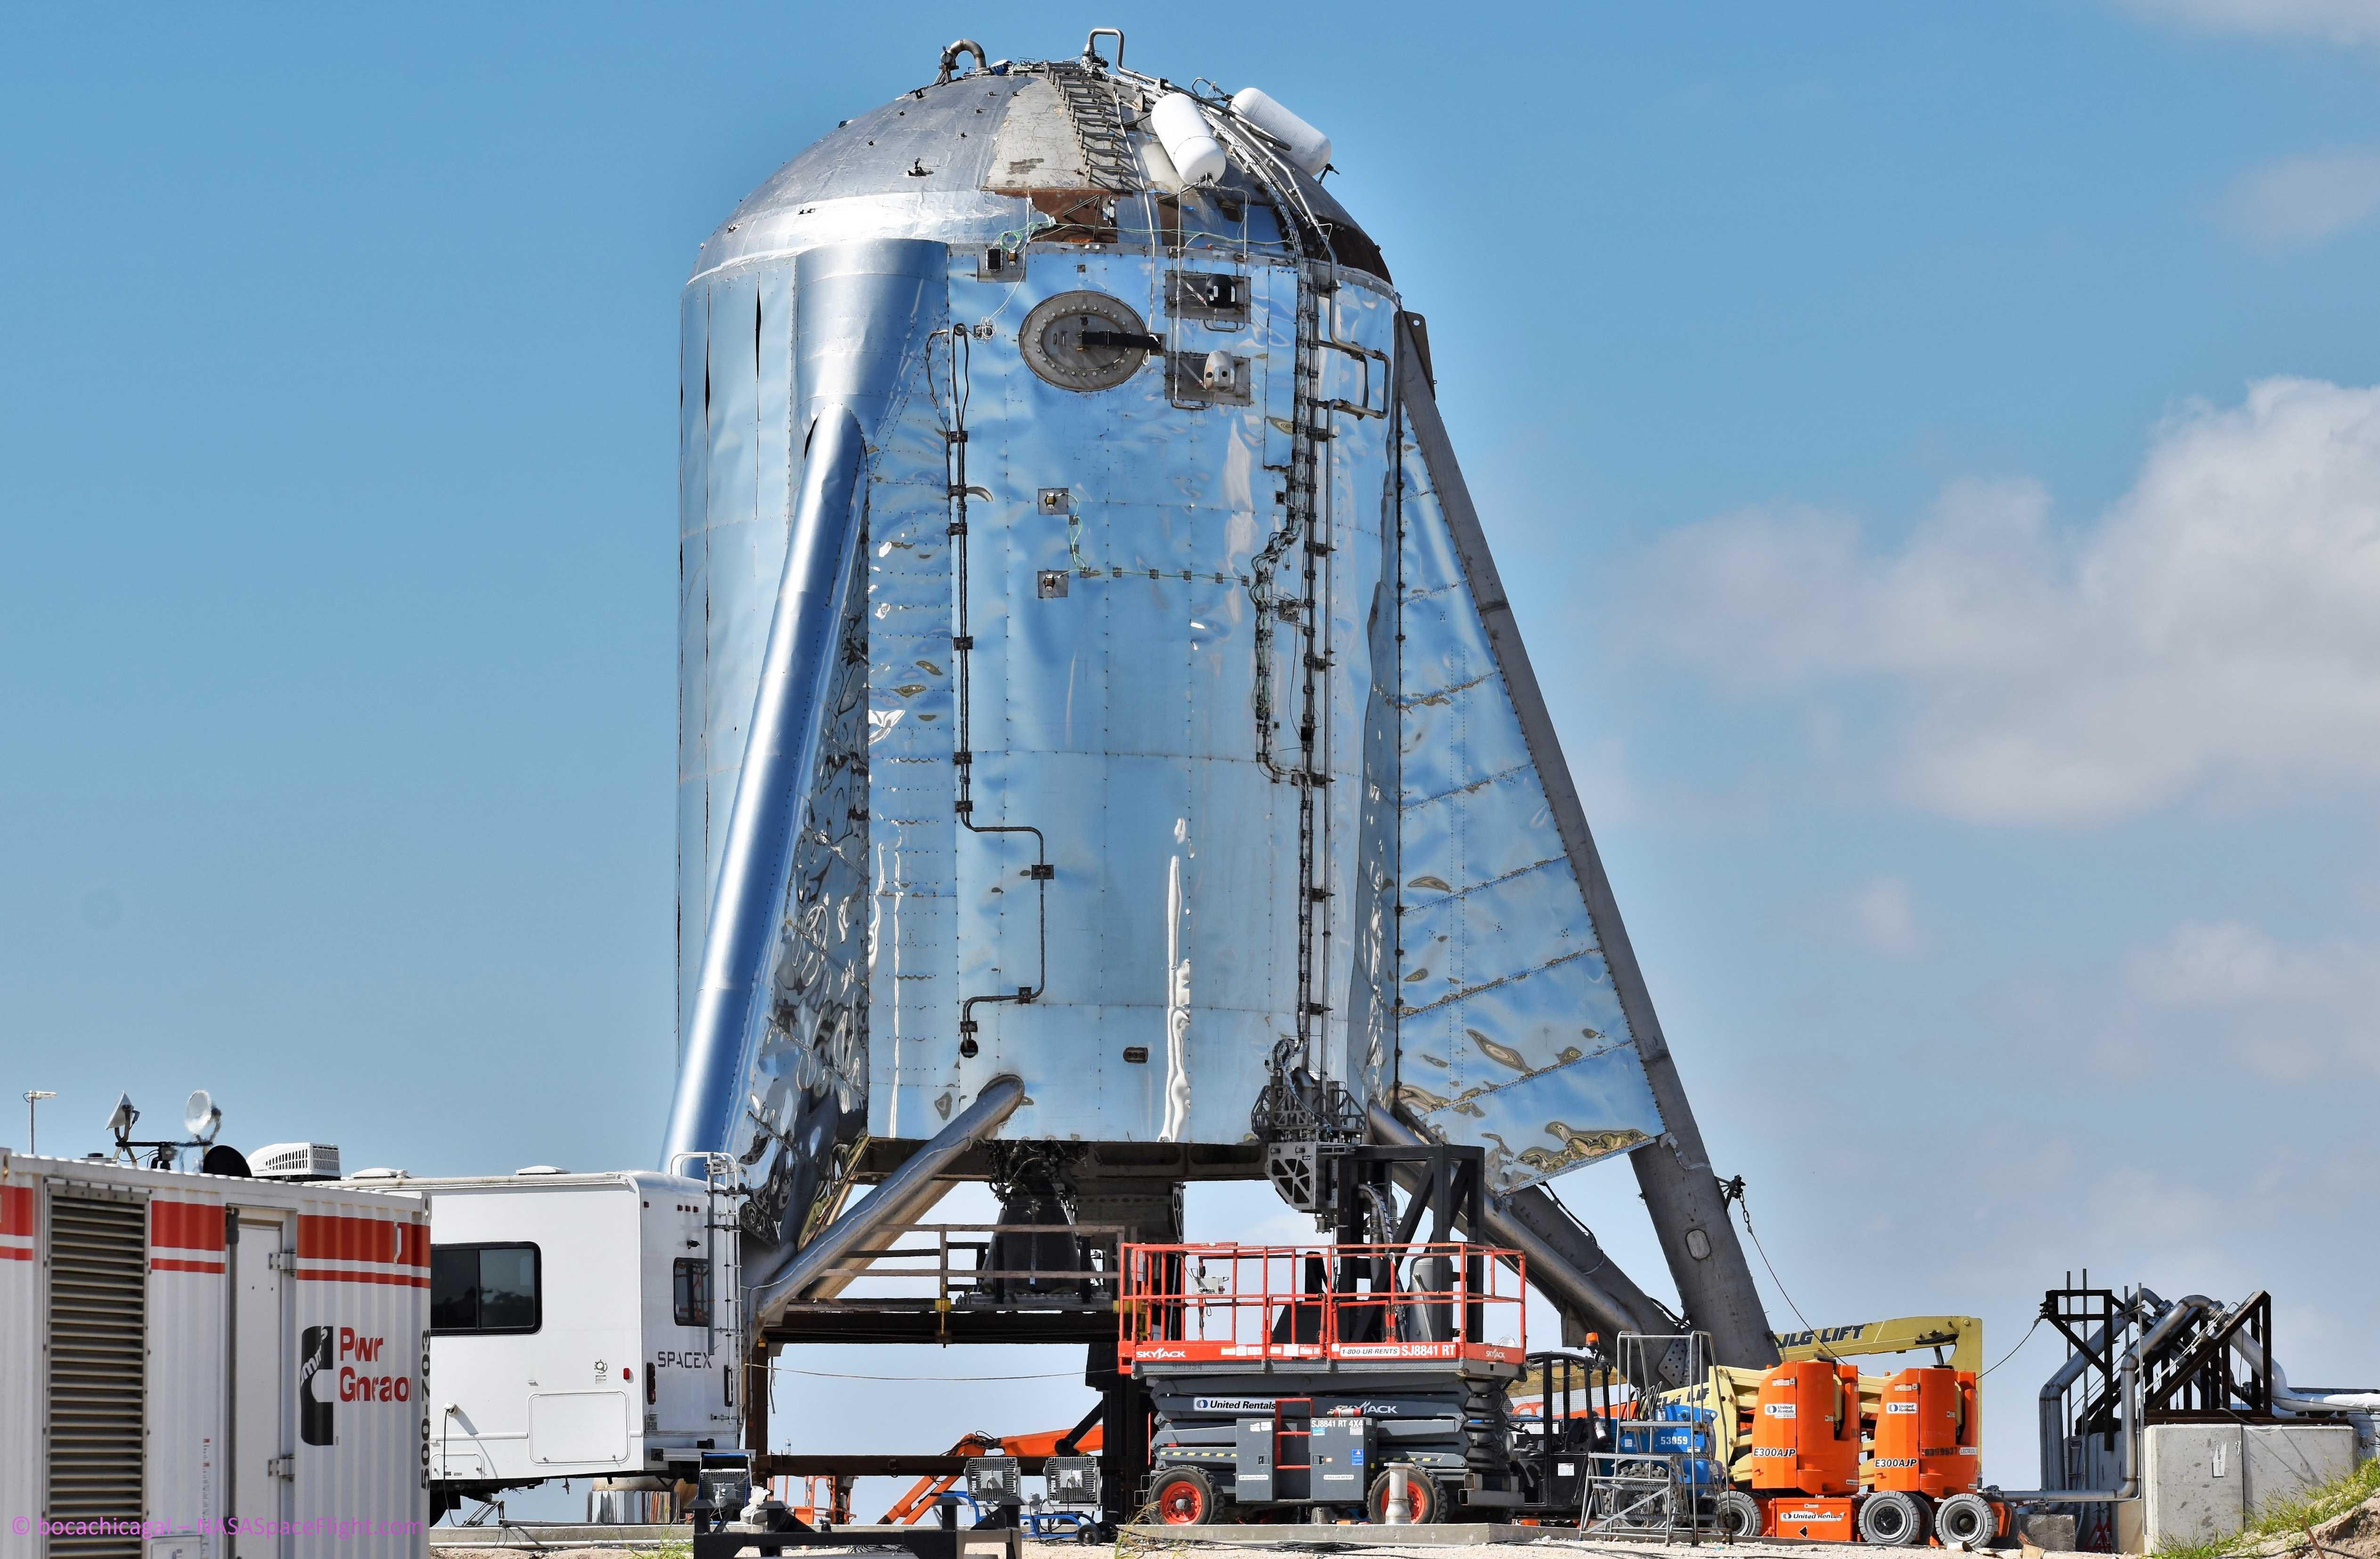 Boca Chica Starhopper Raptor SN06 installation 071119 (NASASpaceflight- bocachicagal) 3 (c)